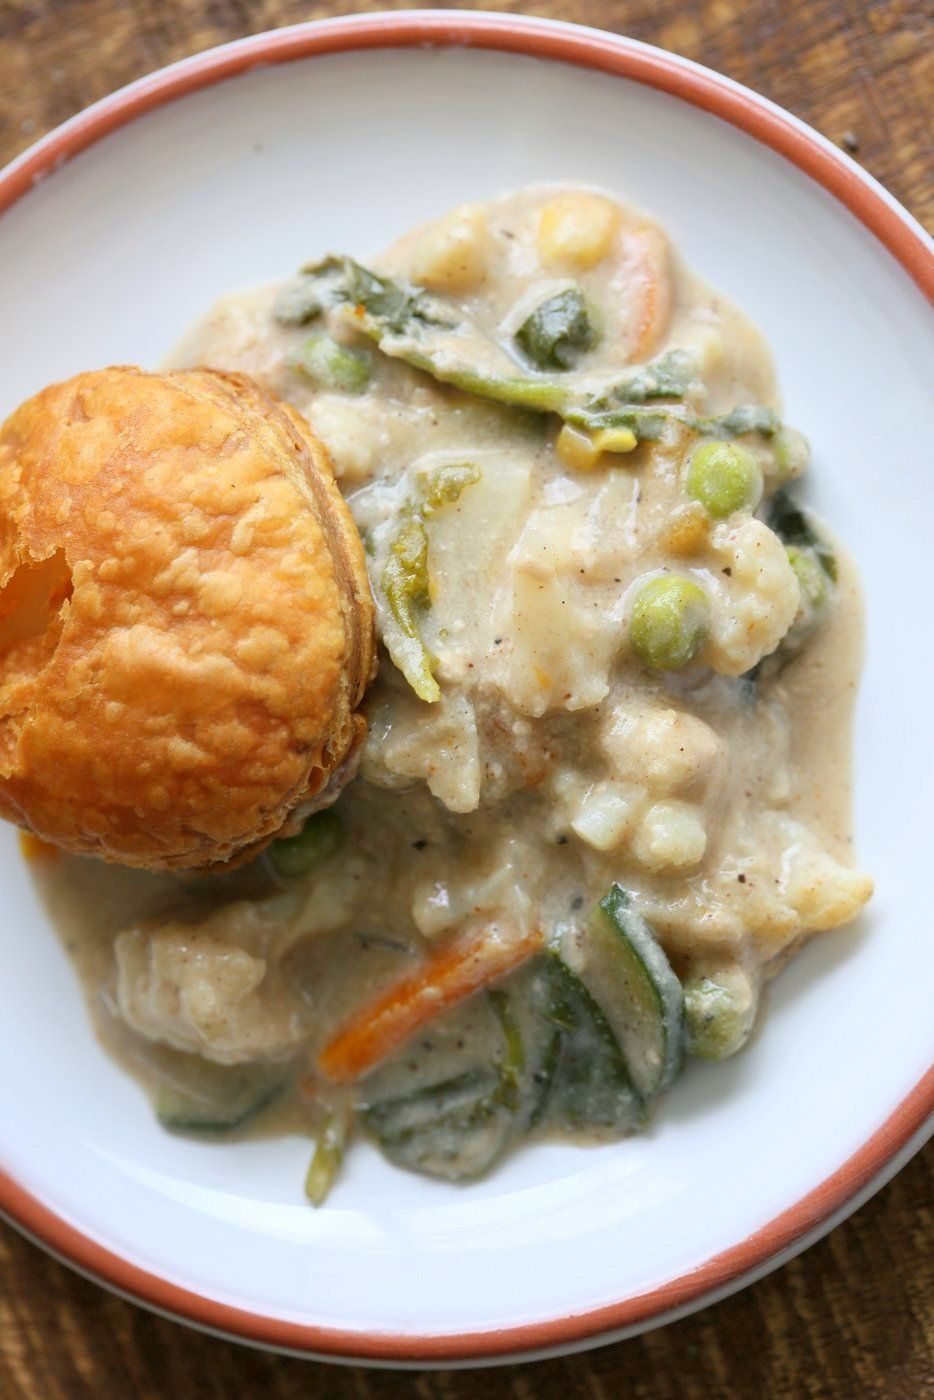 1 Hour Masala Vegetable Pot Pie Recipe Vegetarian Pot Pie Vegetable Pot Pies Recipes